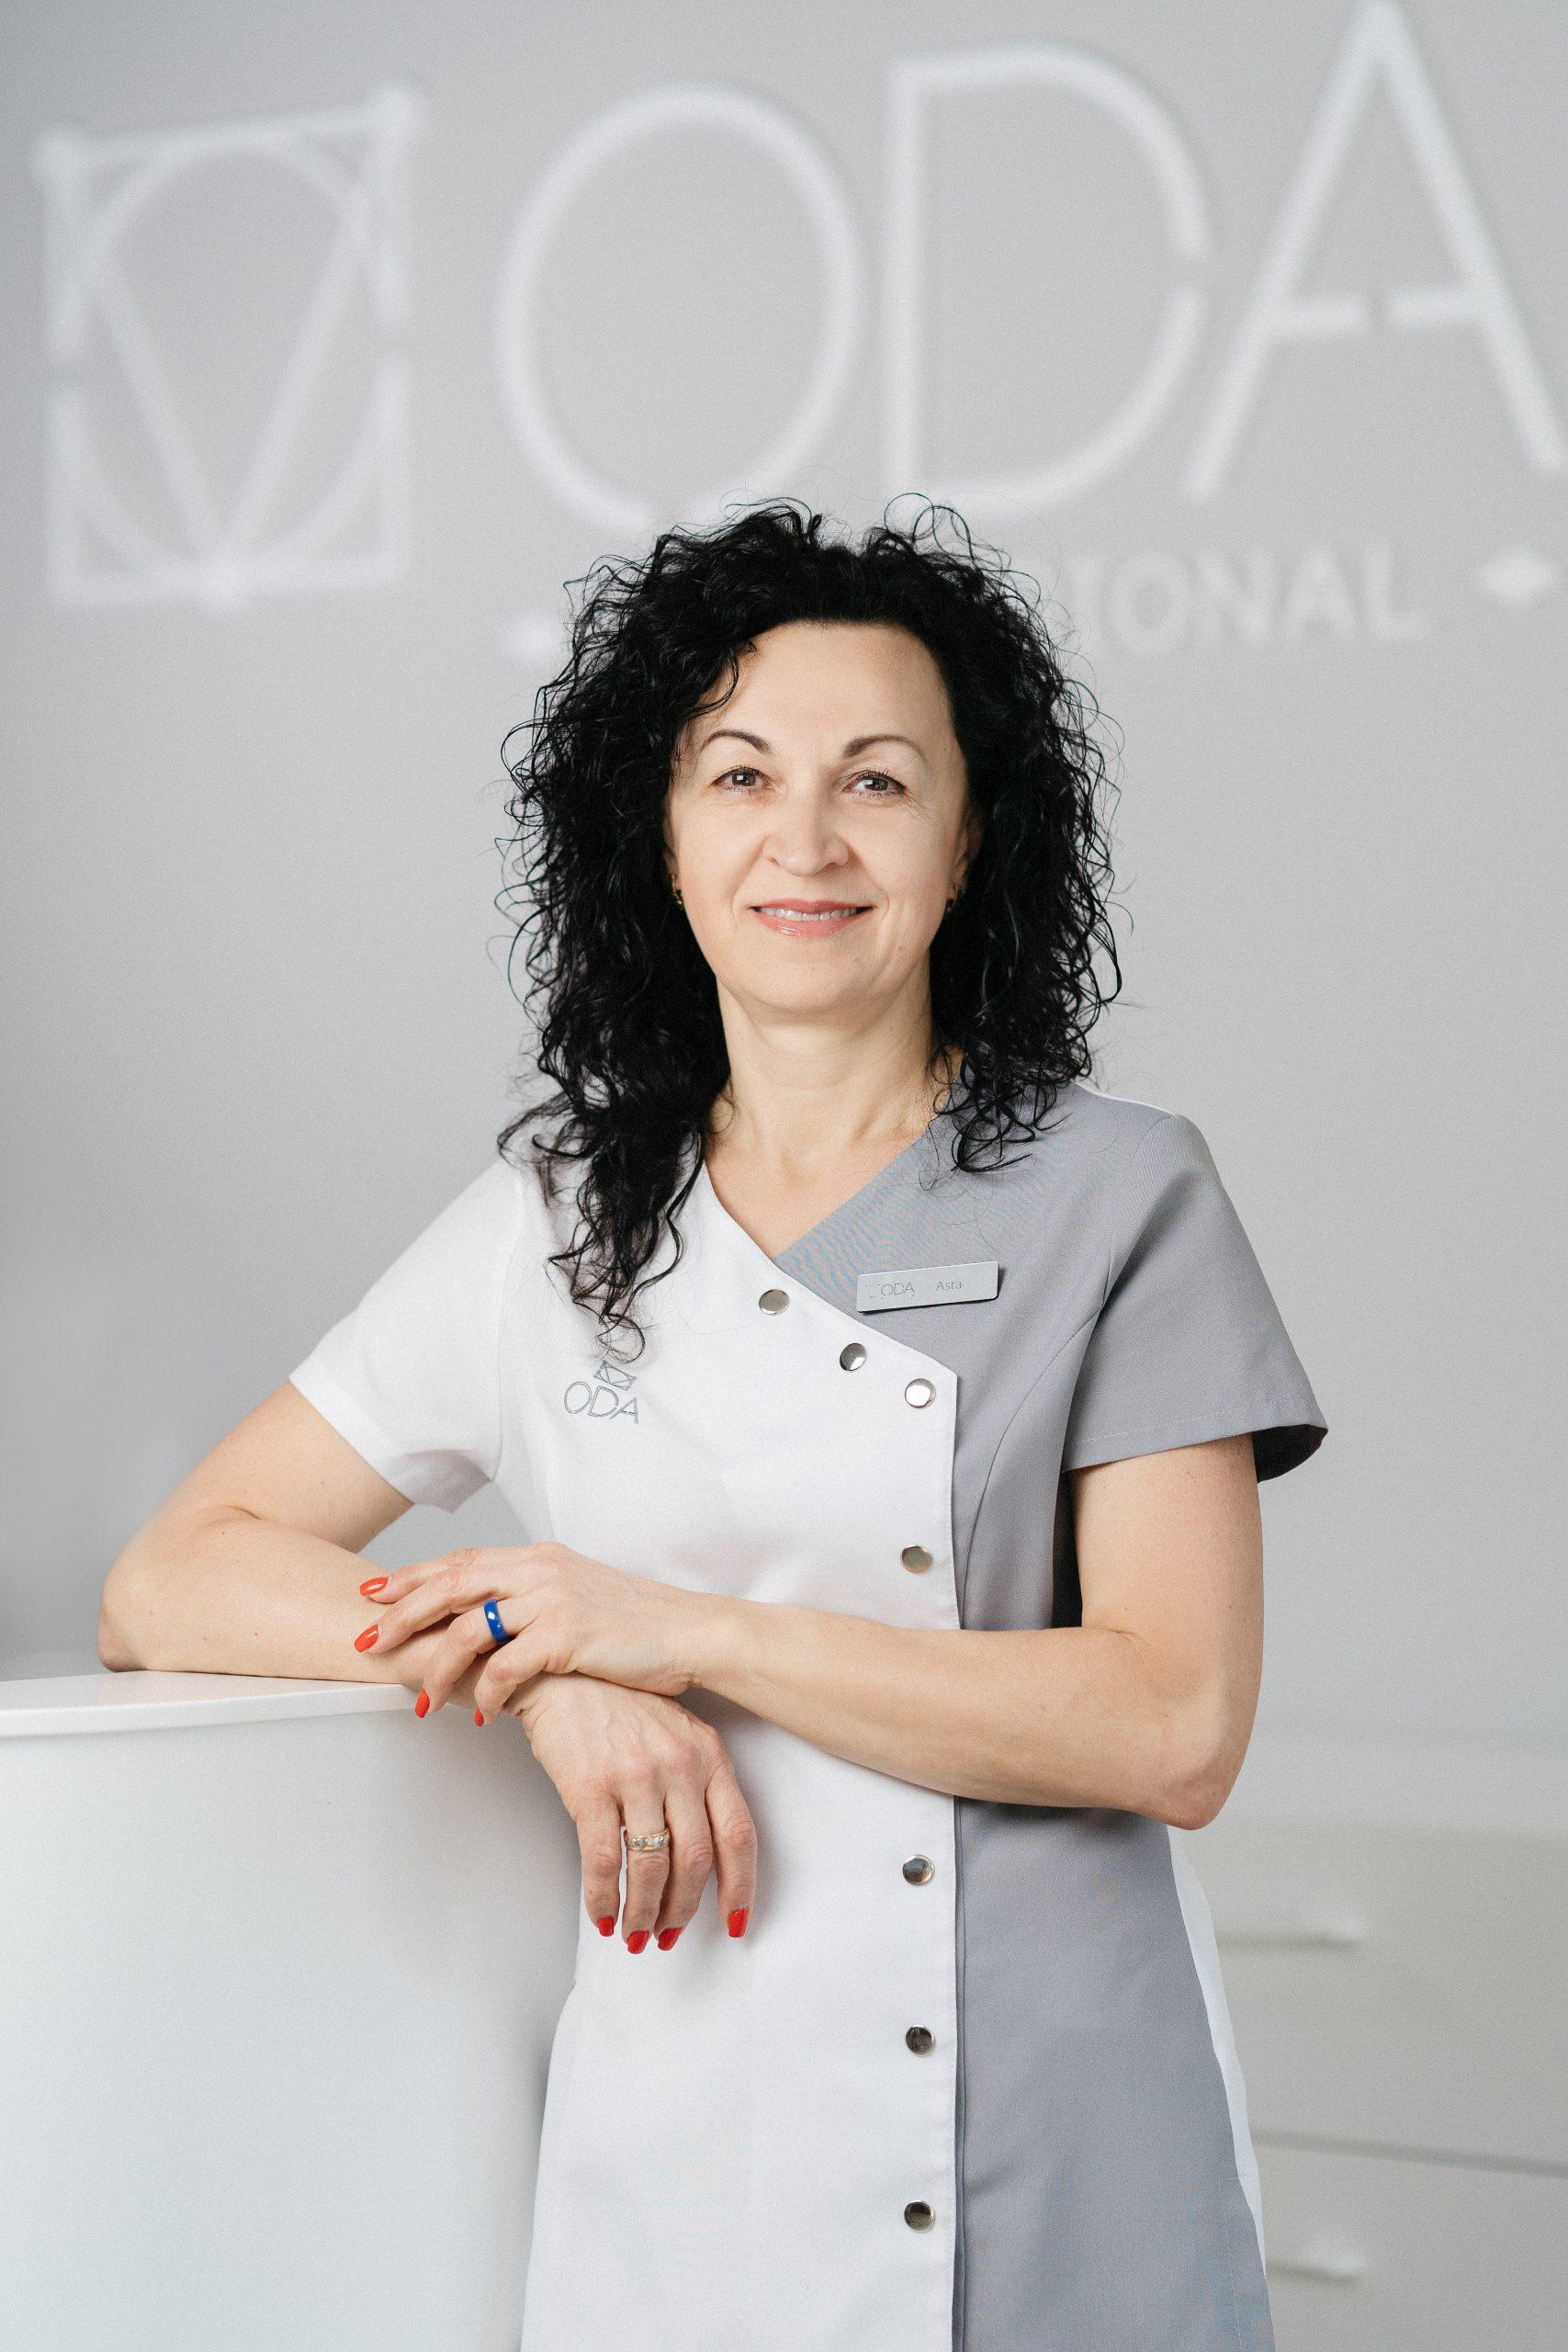 Eglė Geležinytė